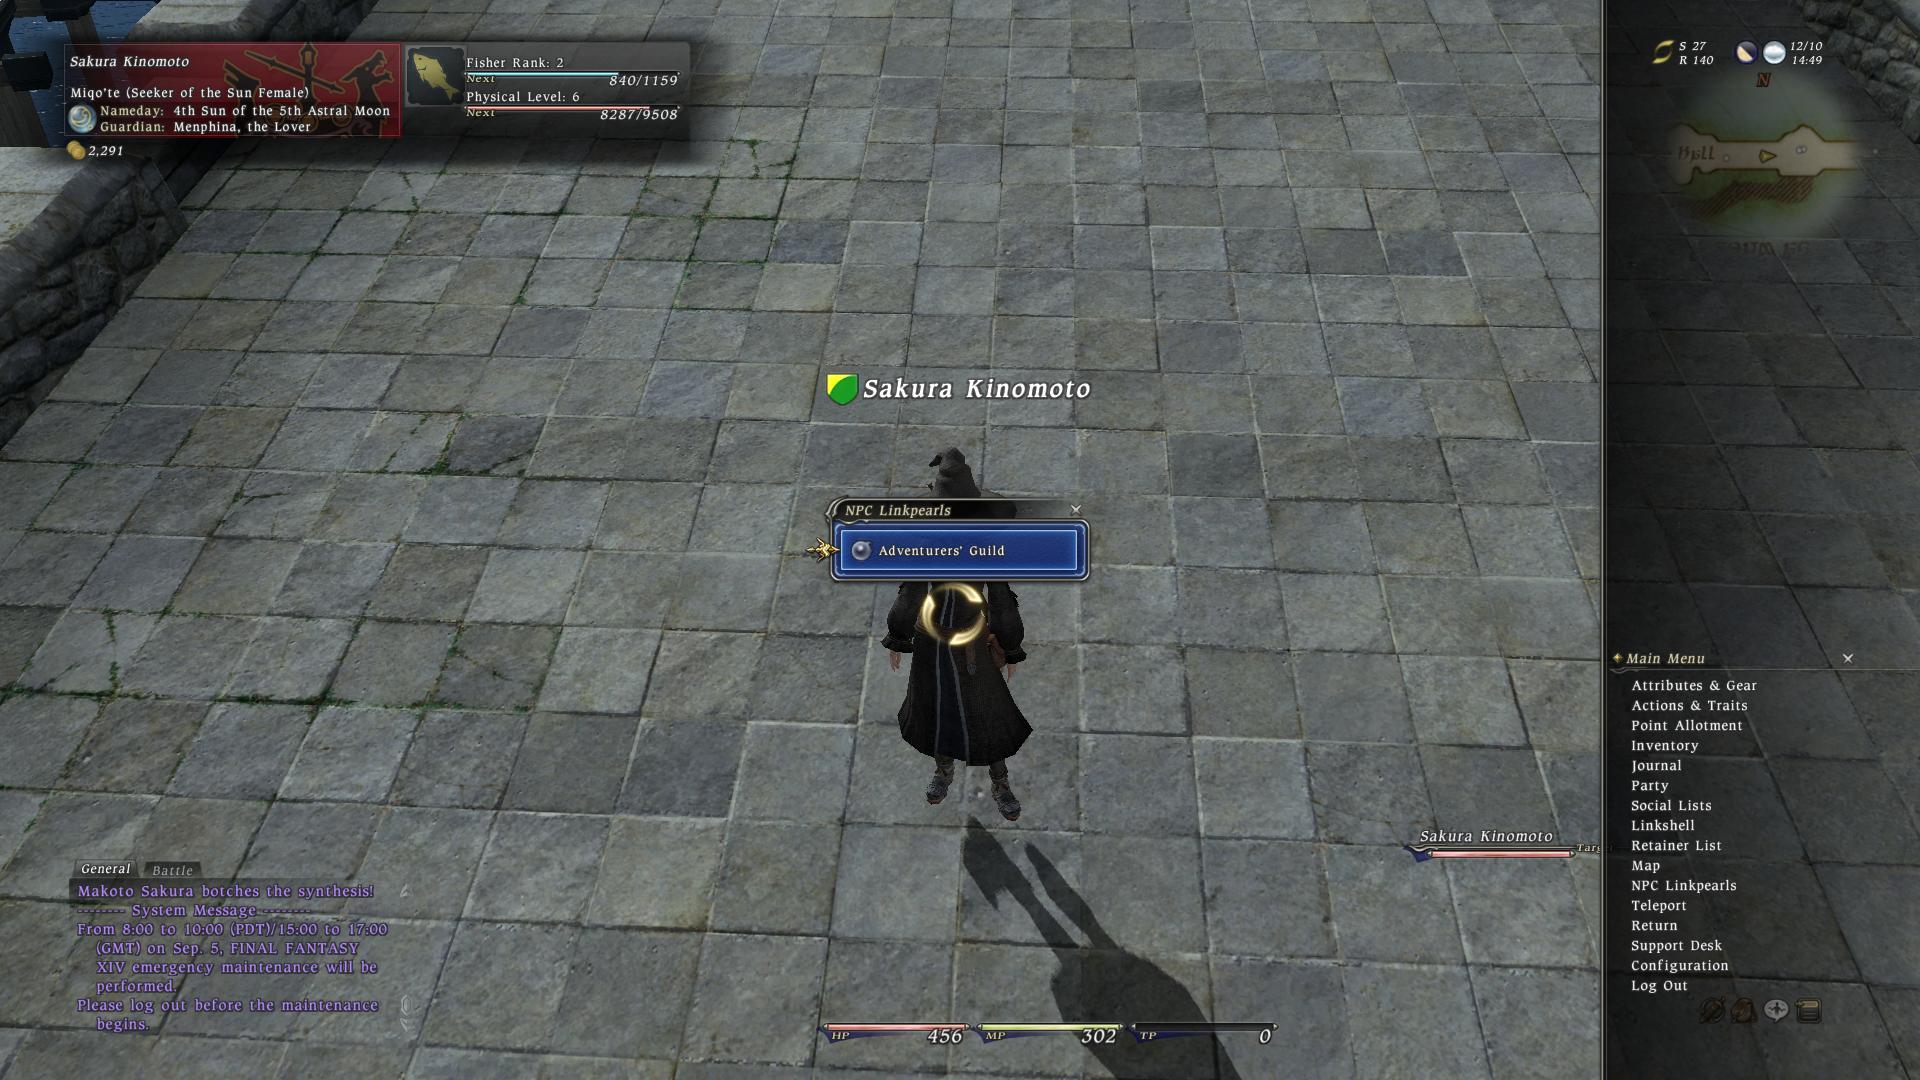 Final Fantasy XIV Daily Digest #2 - 15